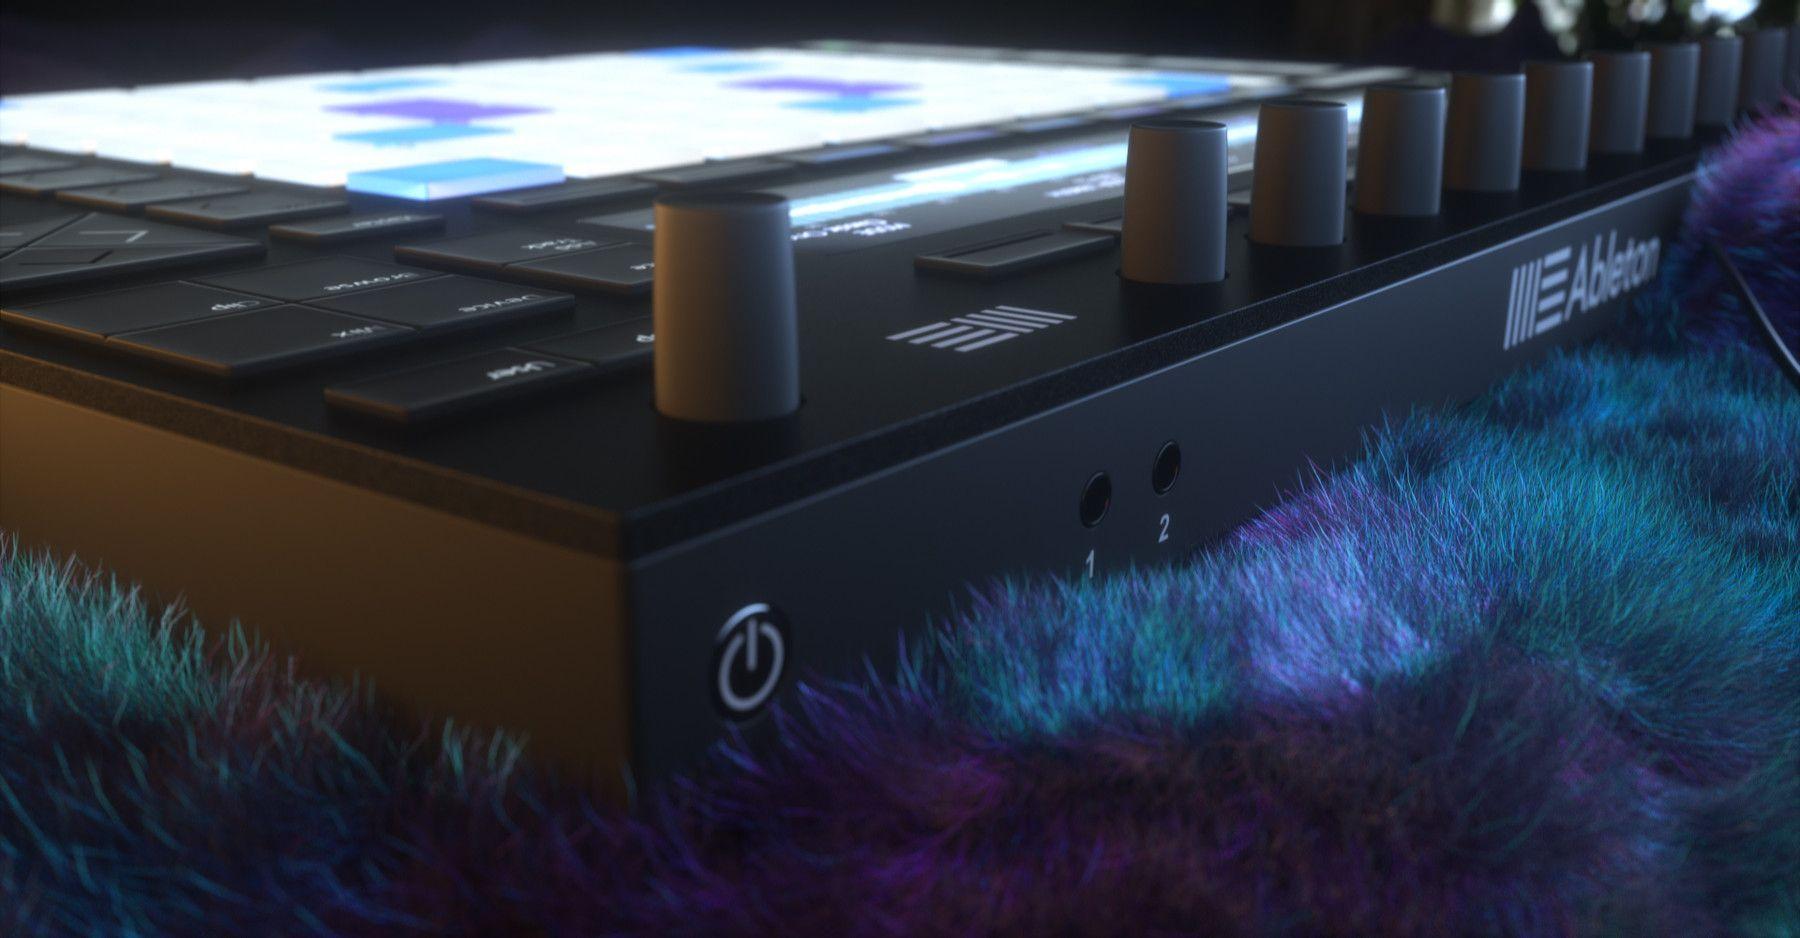 Ableton Push 2 Midi Controller 3D Model Hard surface high